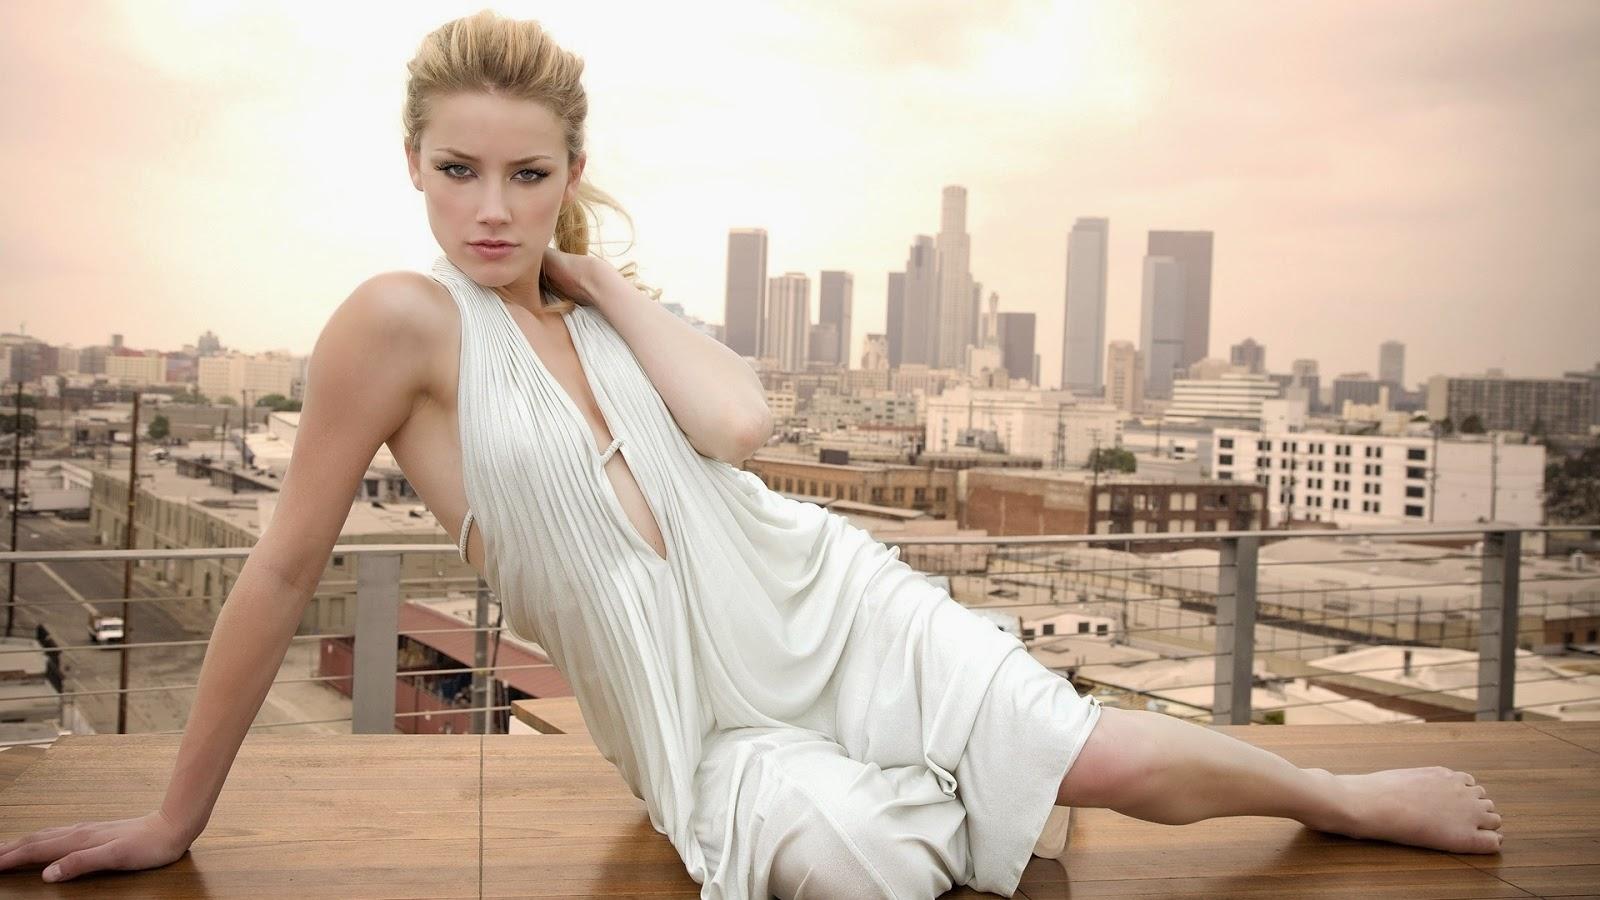 Elegant Amber Heard